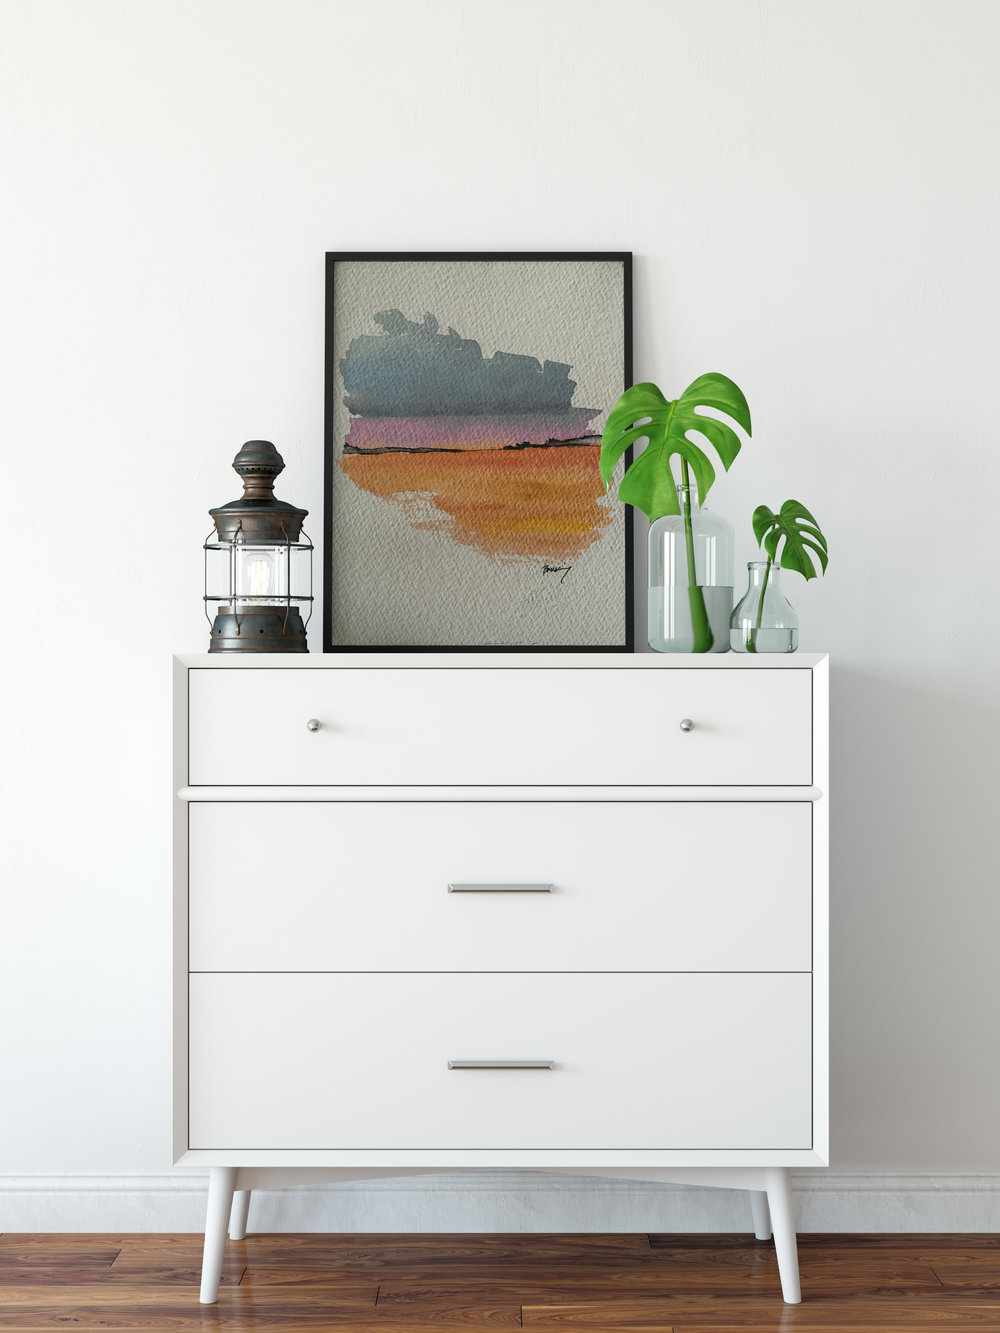 Random Small Works - Under $100